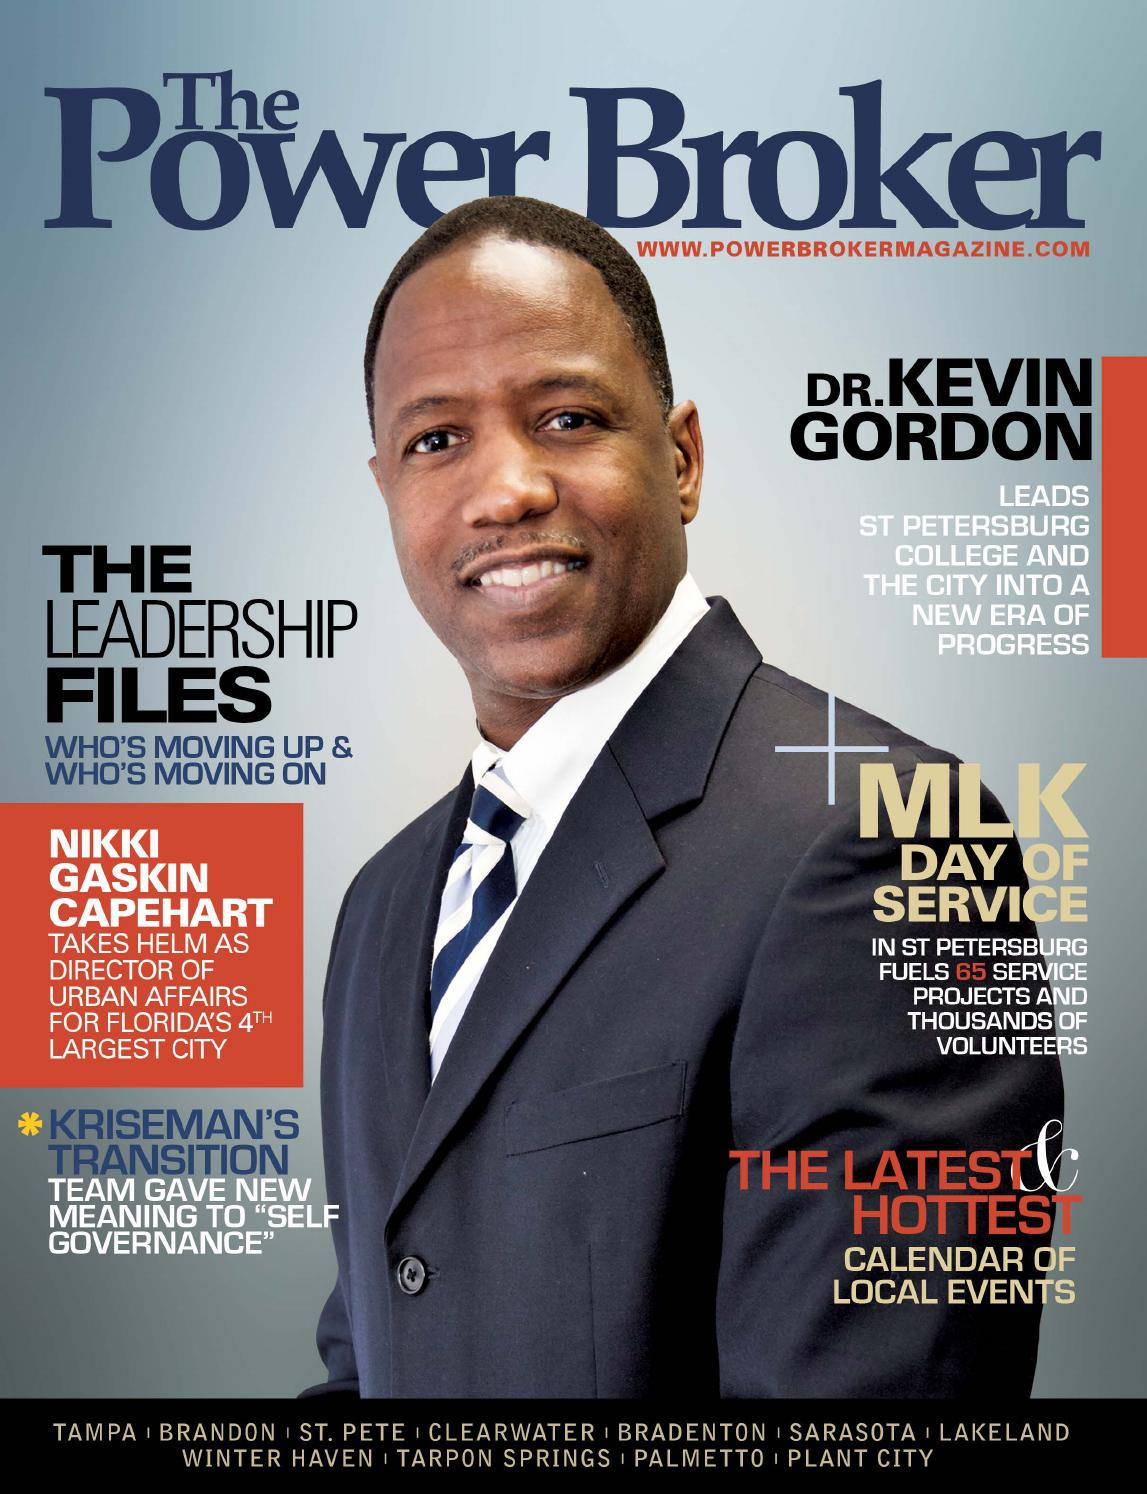 The Power Broker magazine FebruaryMarch 2014 by Gypsy Gallardo